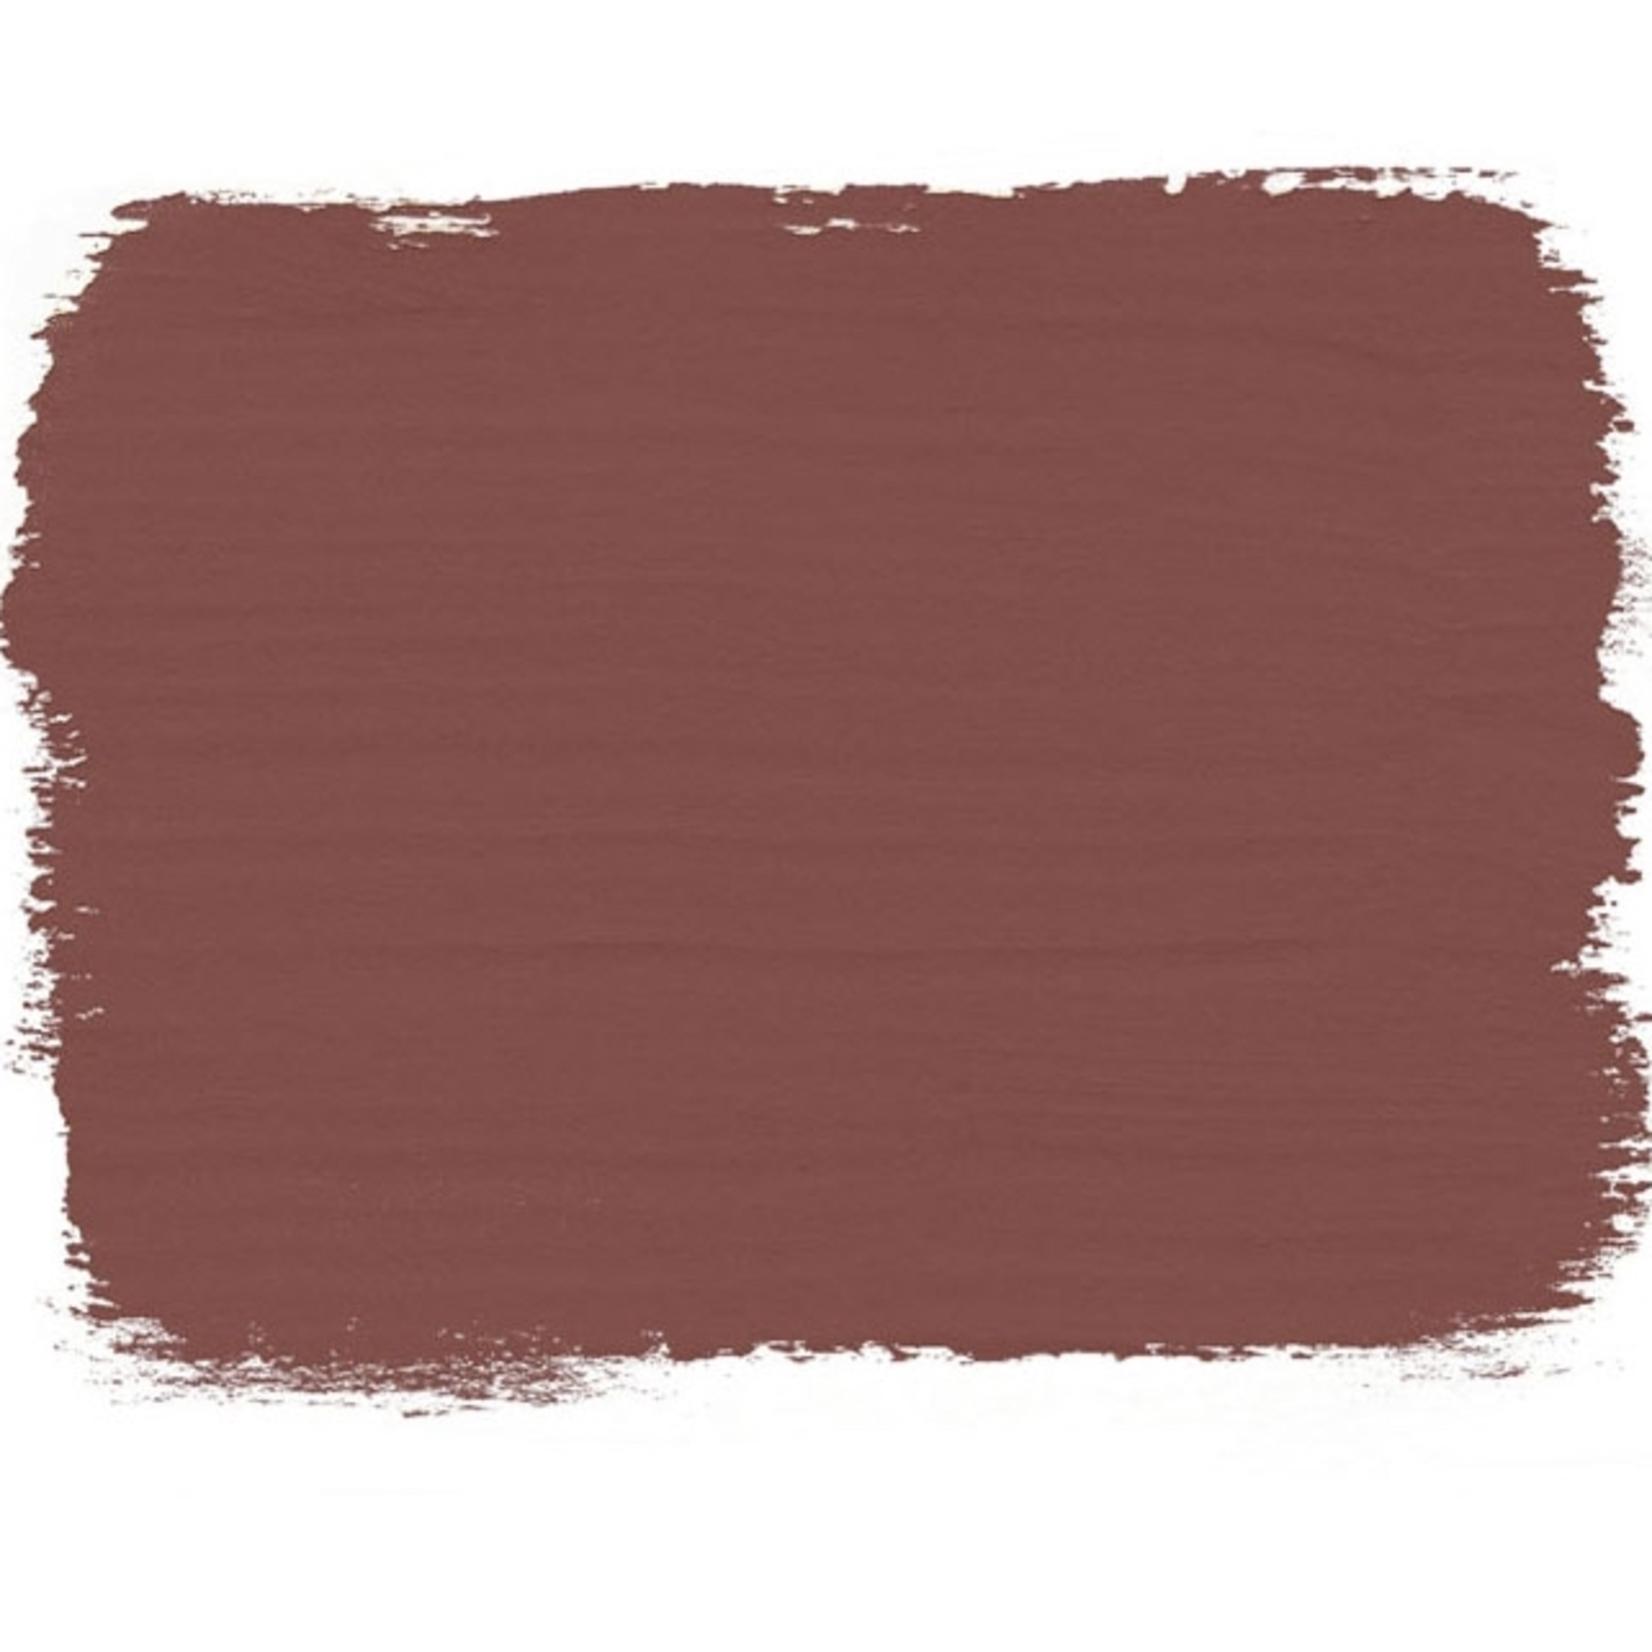 Annie Sloan Annie Sloan Primer Red 120ml Chalk Paint